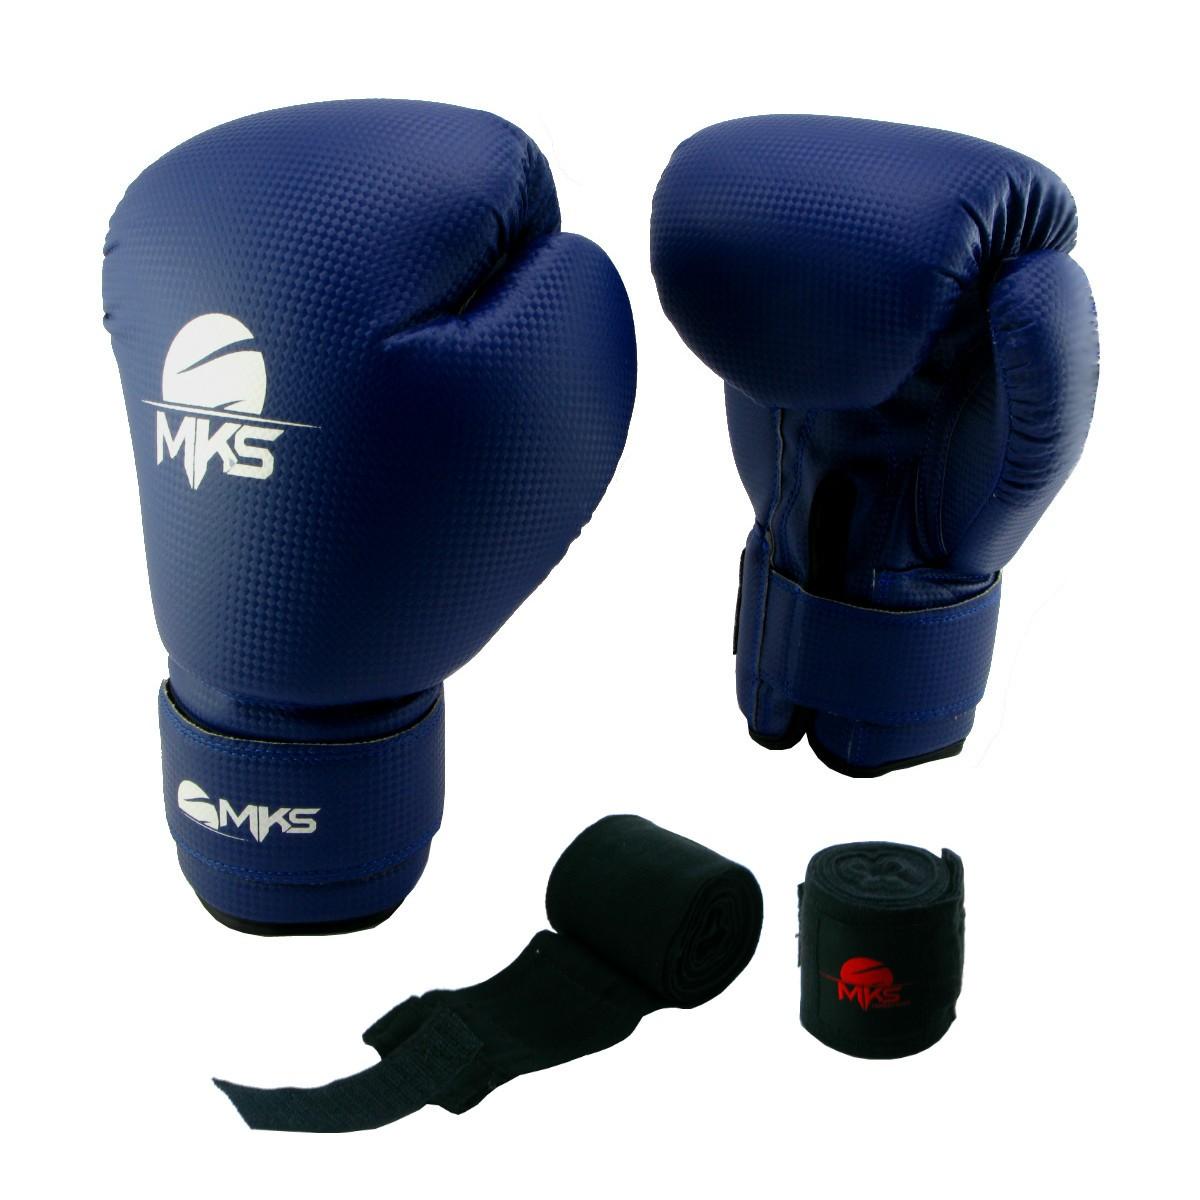 Luva de Boxe Prospect MKS Blue 14 oz + bandagem